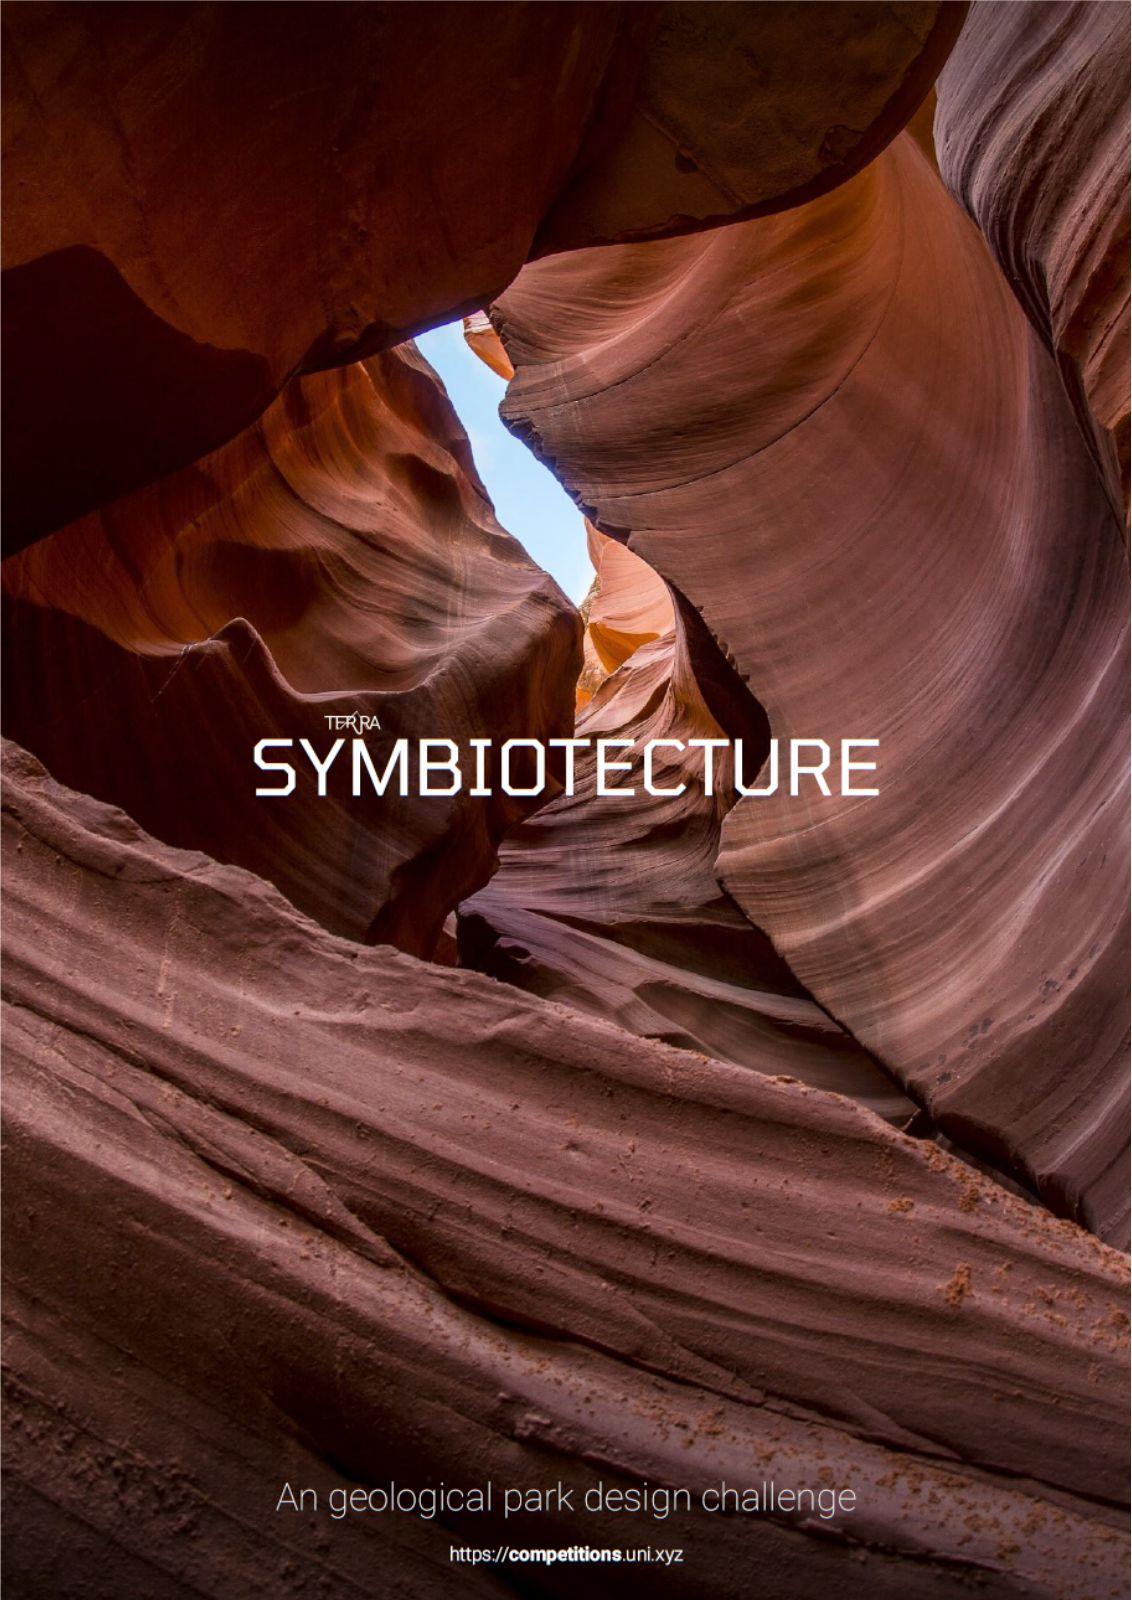 SYMBIOTECTURE